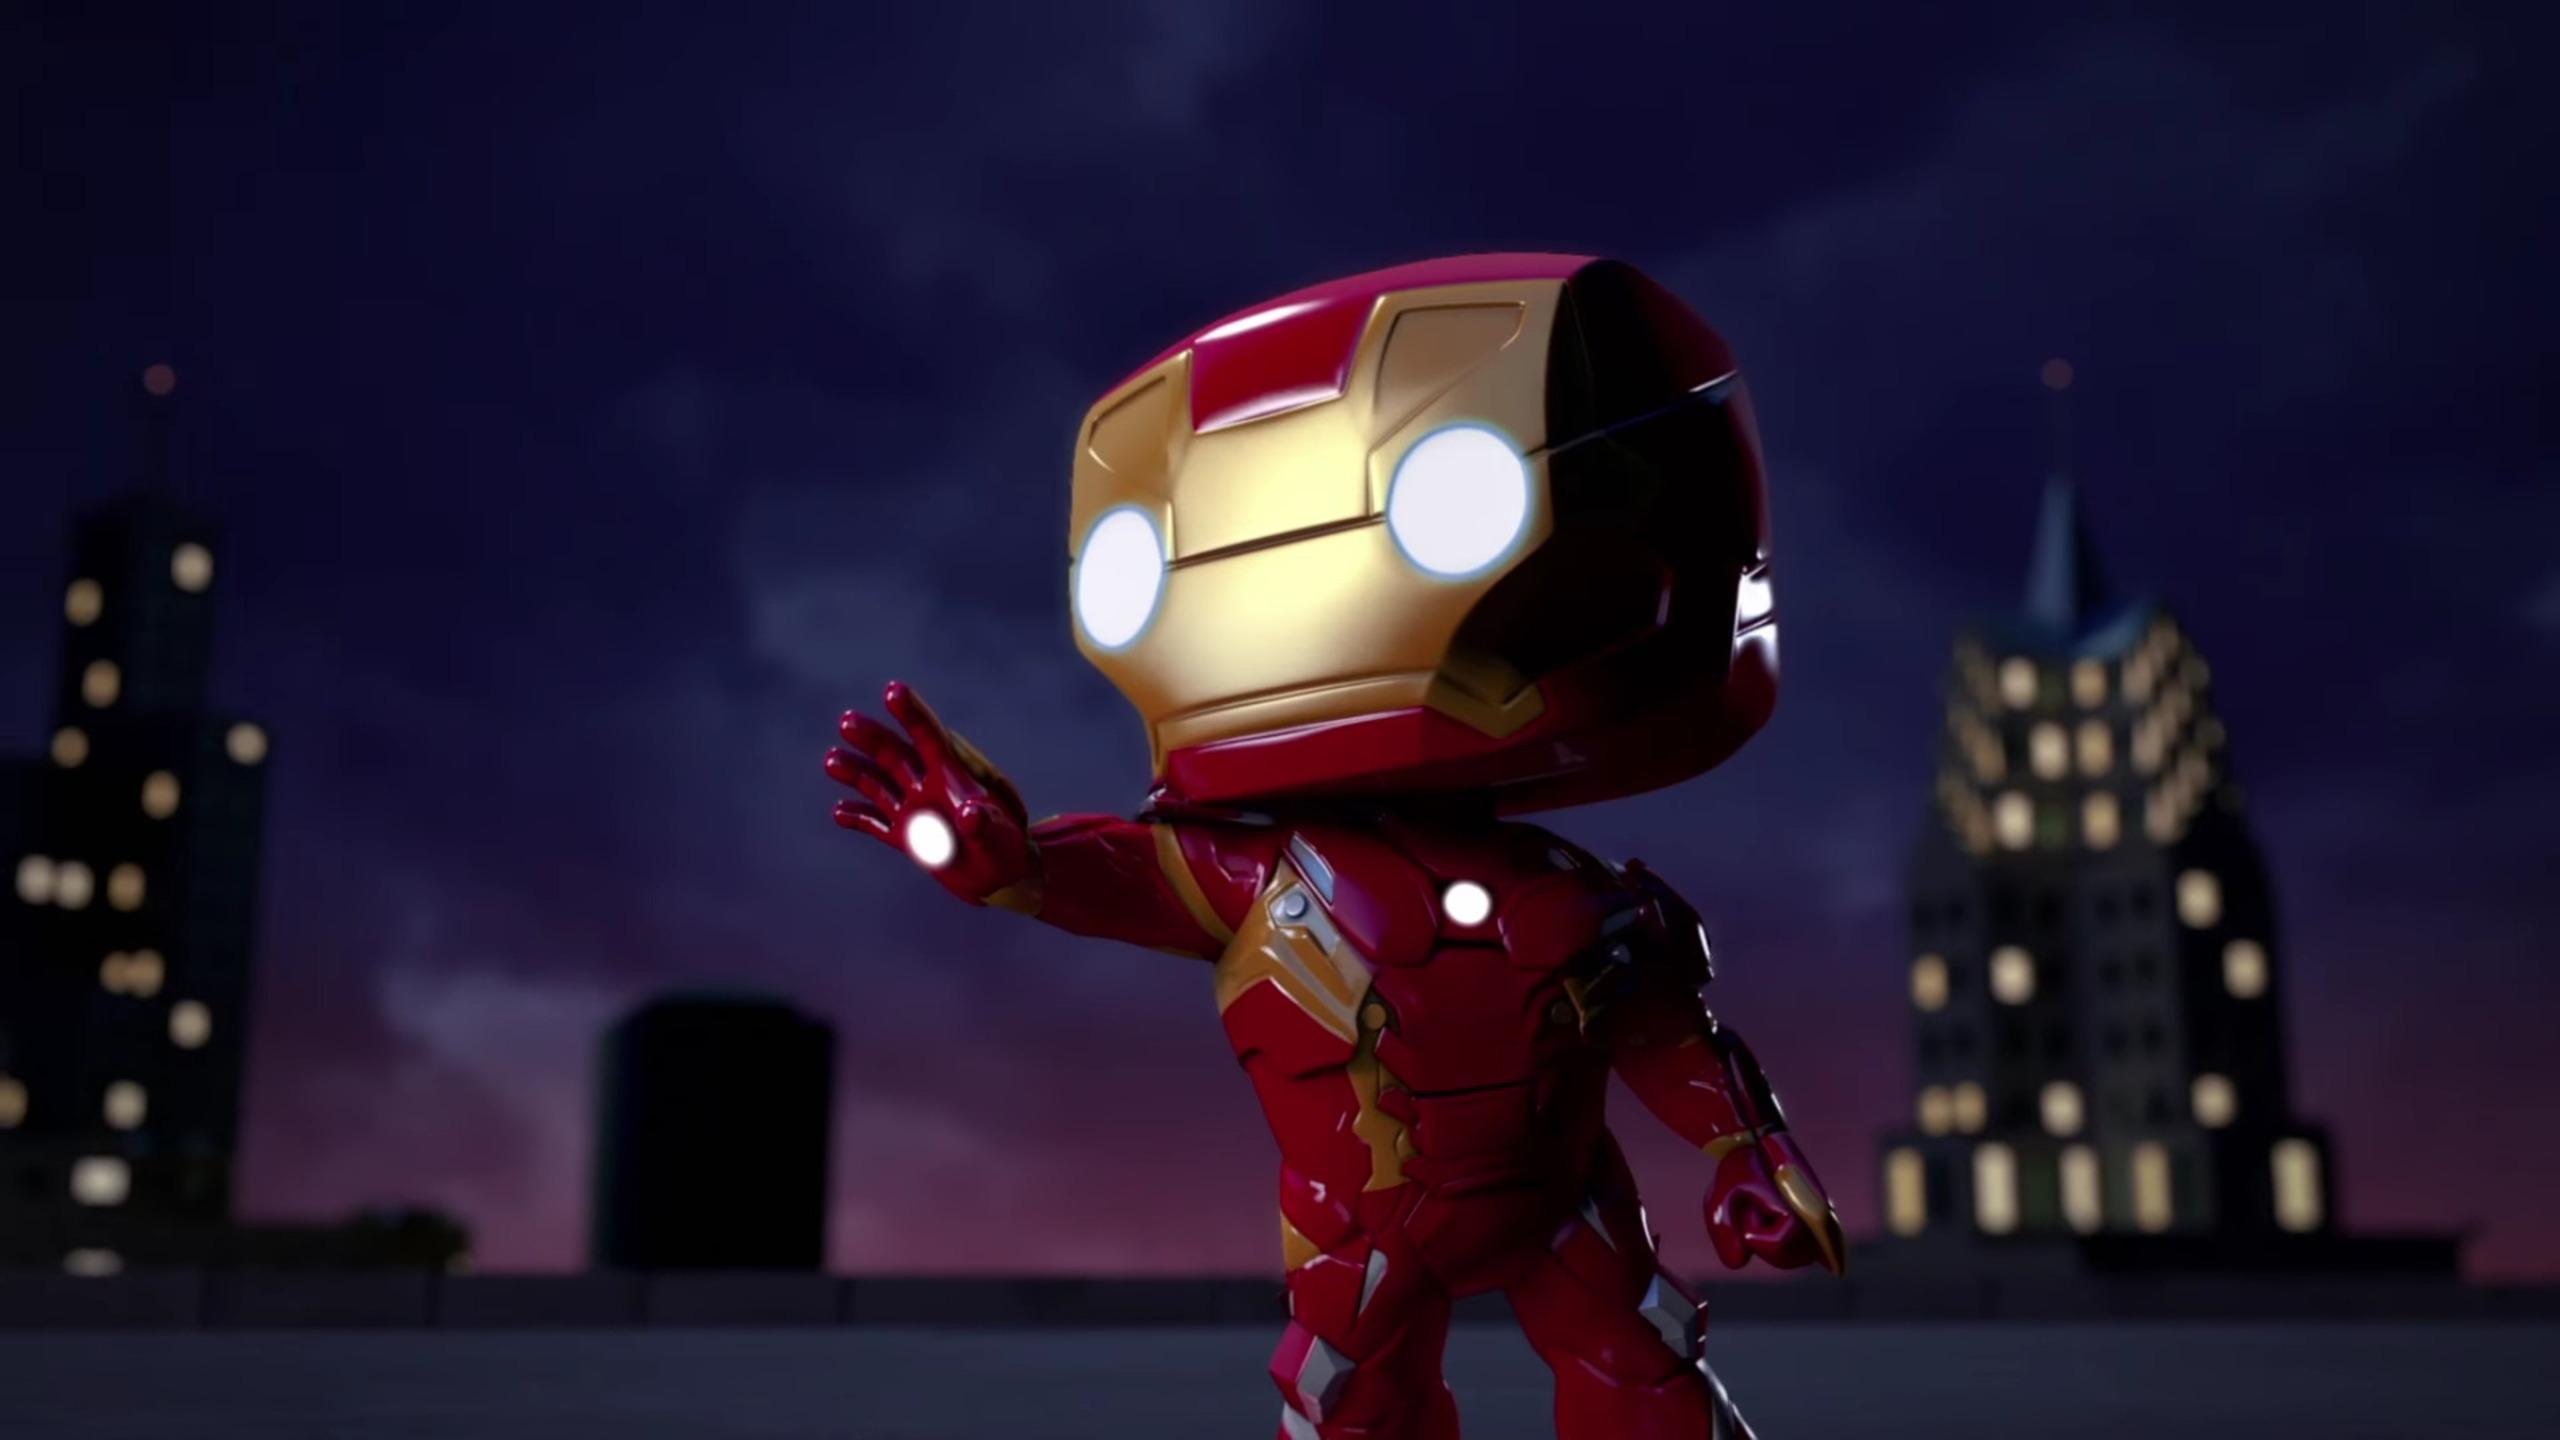 2560x1440 Iron Man Spellbound Animated Movie 1440p